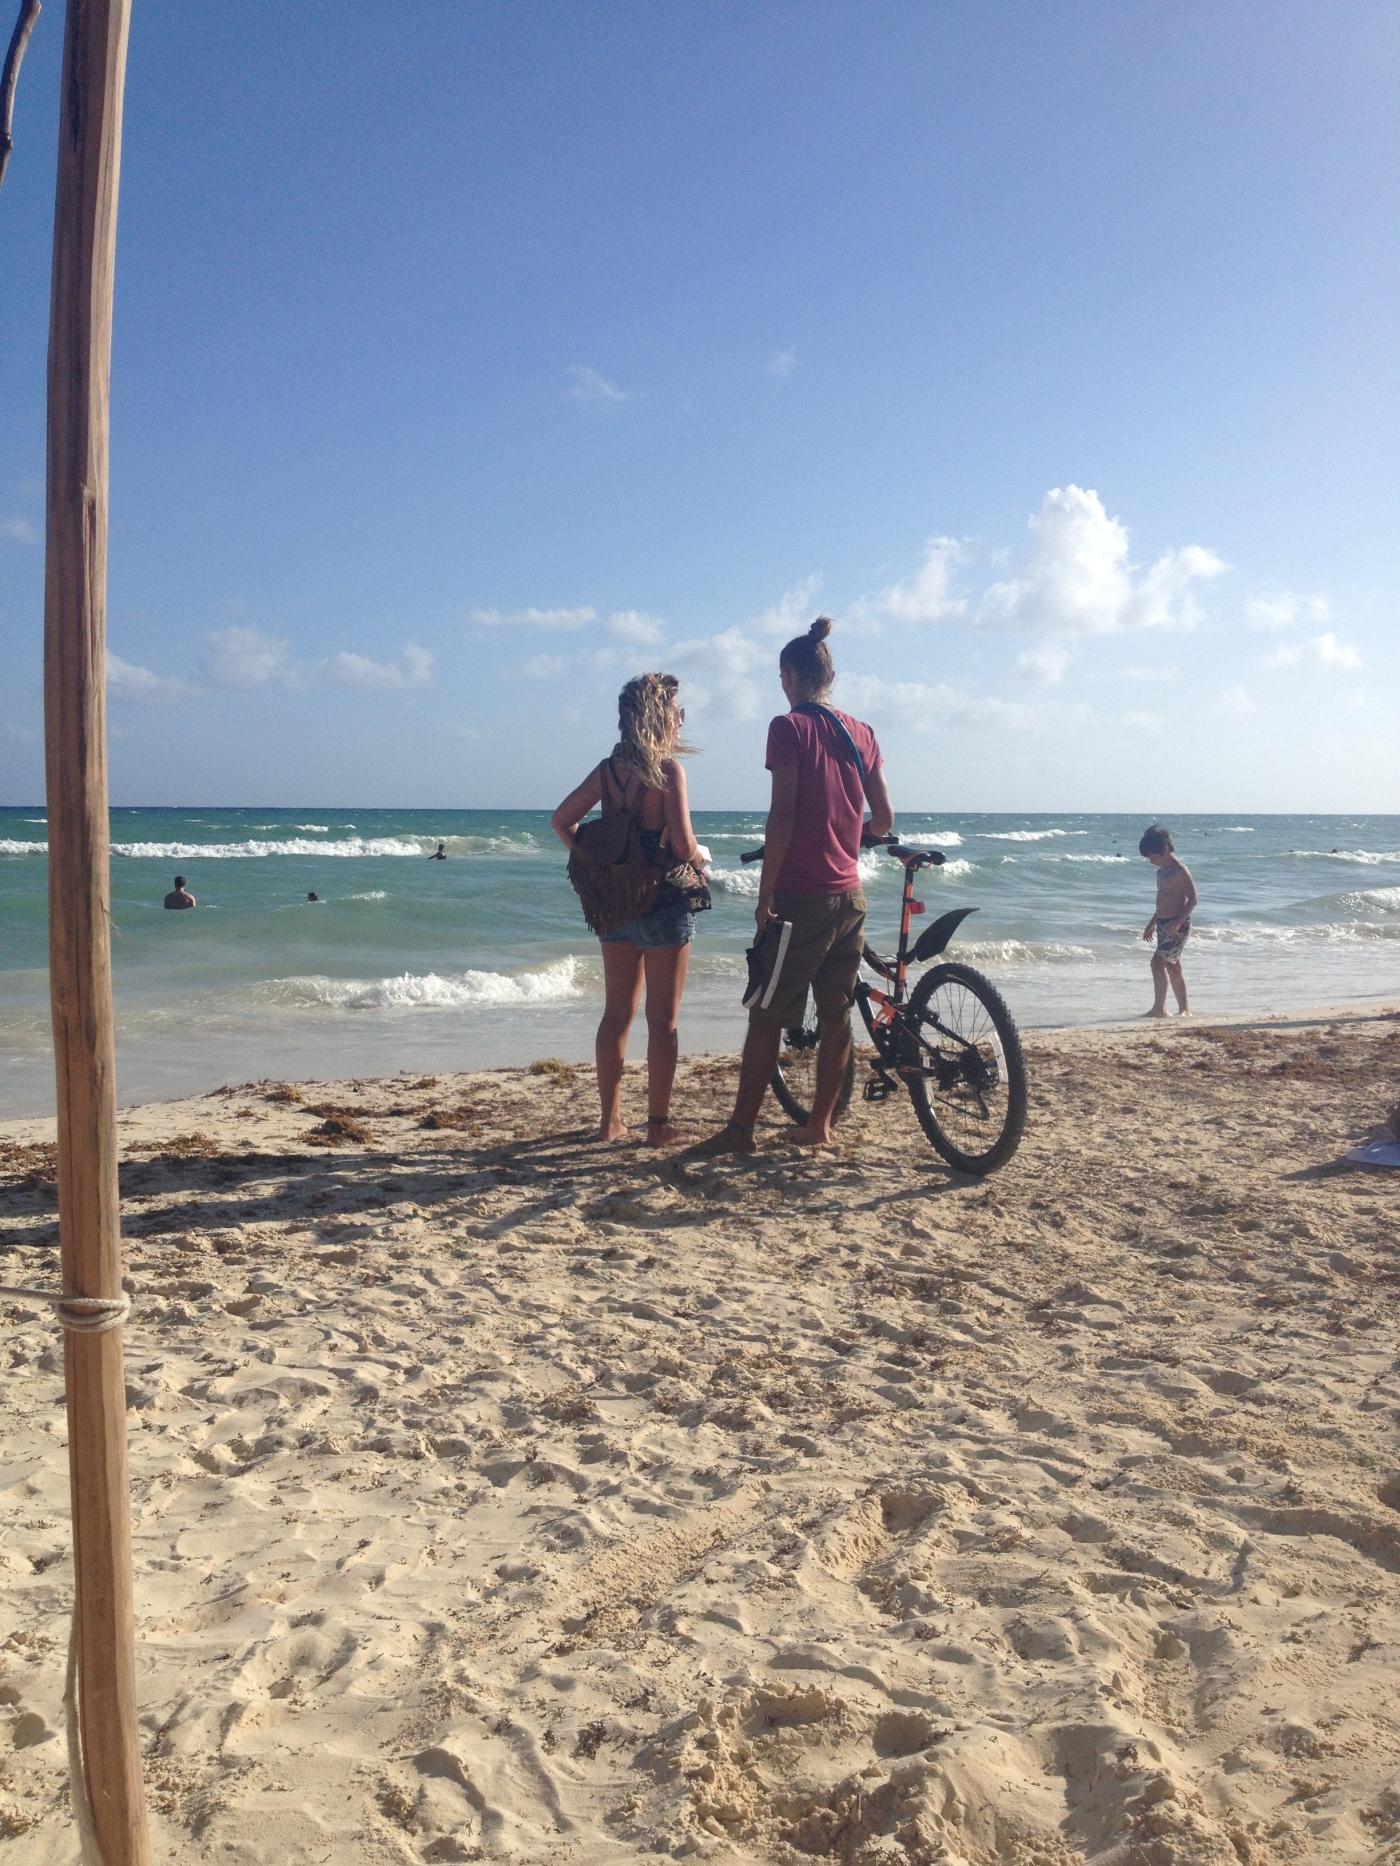 Sunset at Delfines Beach or El Mirador Beach, Hotel Zone, Cancun.